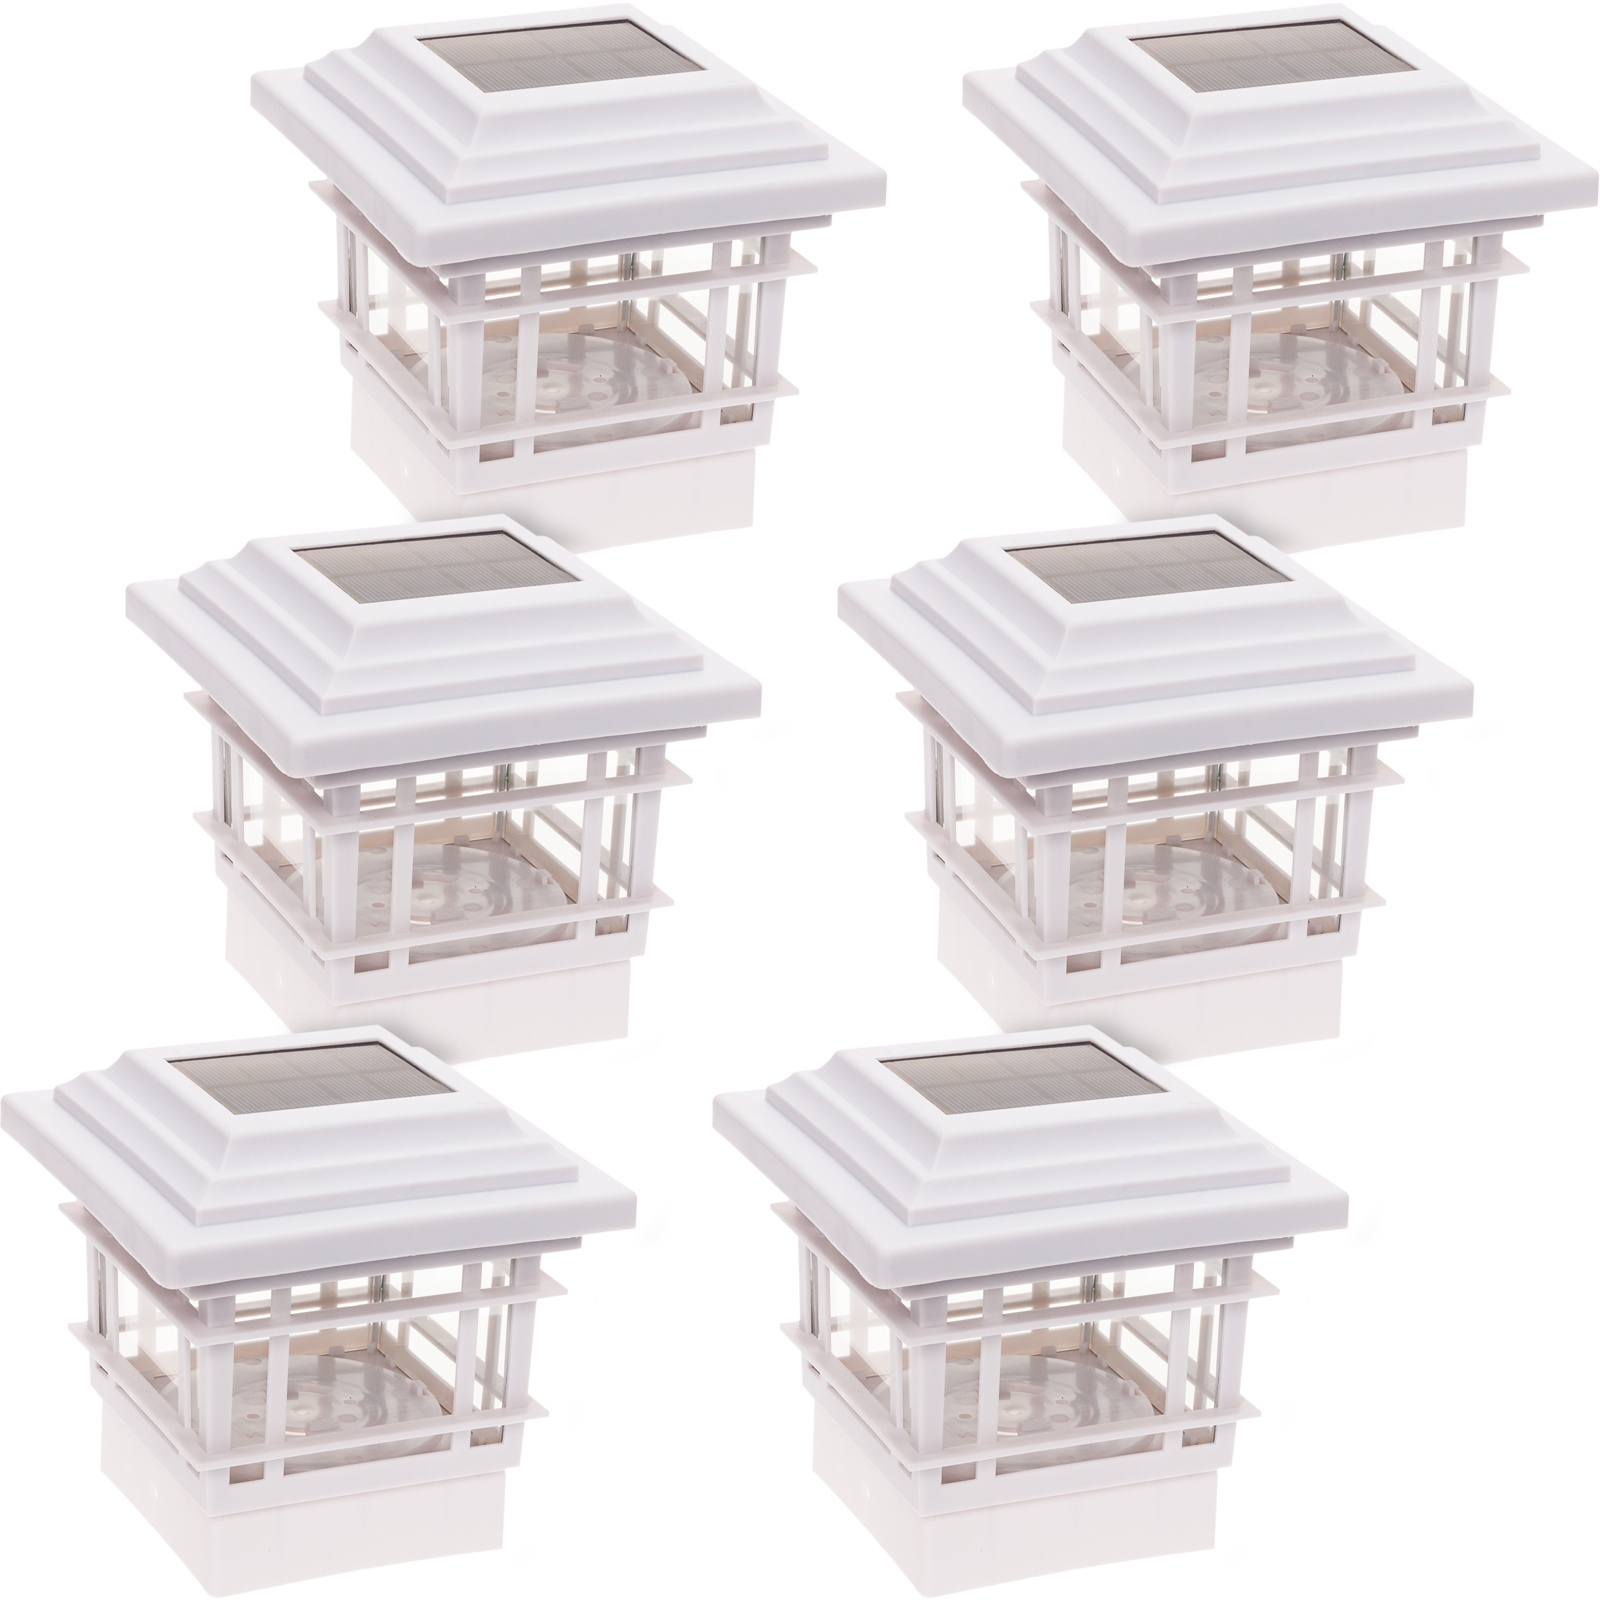 6 Pack Greenlighting Classica High Lumen Deck Fence Solar Post Cap Lights By Greenlighting Shop Online For Homeware In Australia